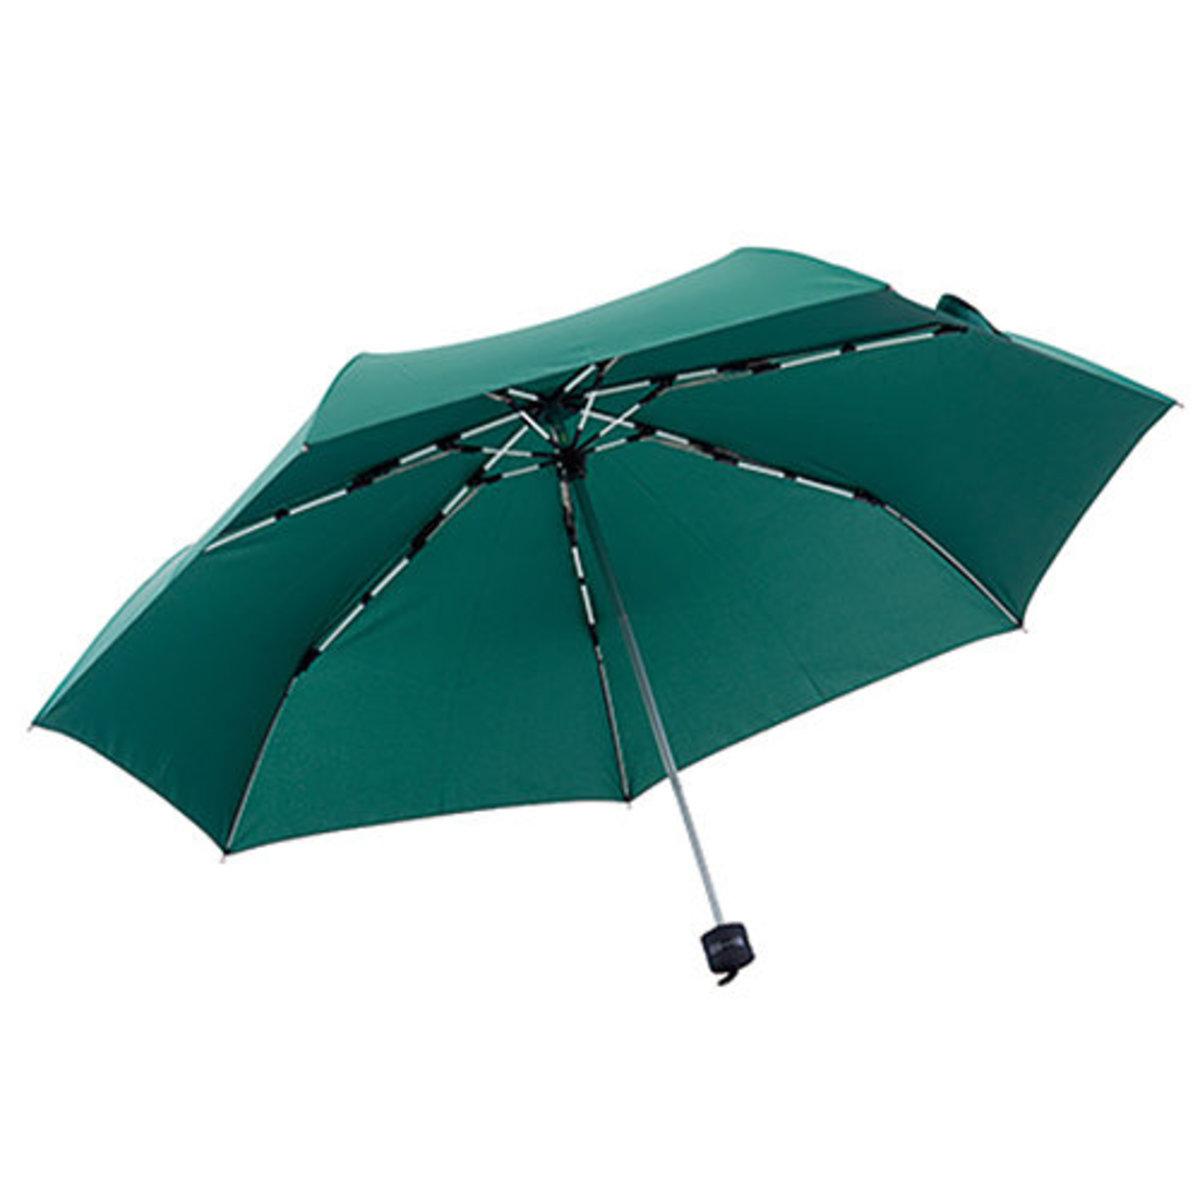 High Strength Folding Umbrella Mini Dark Green (Made in China)